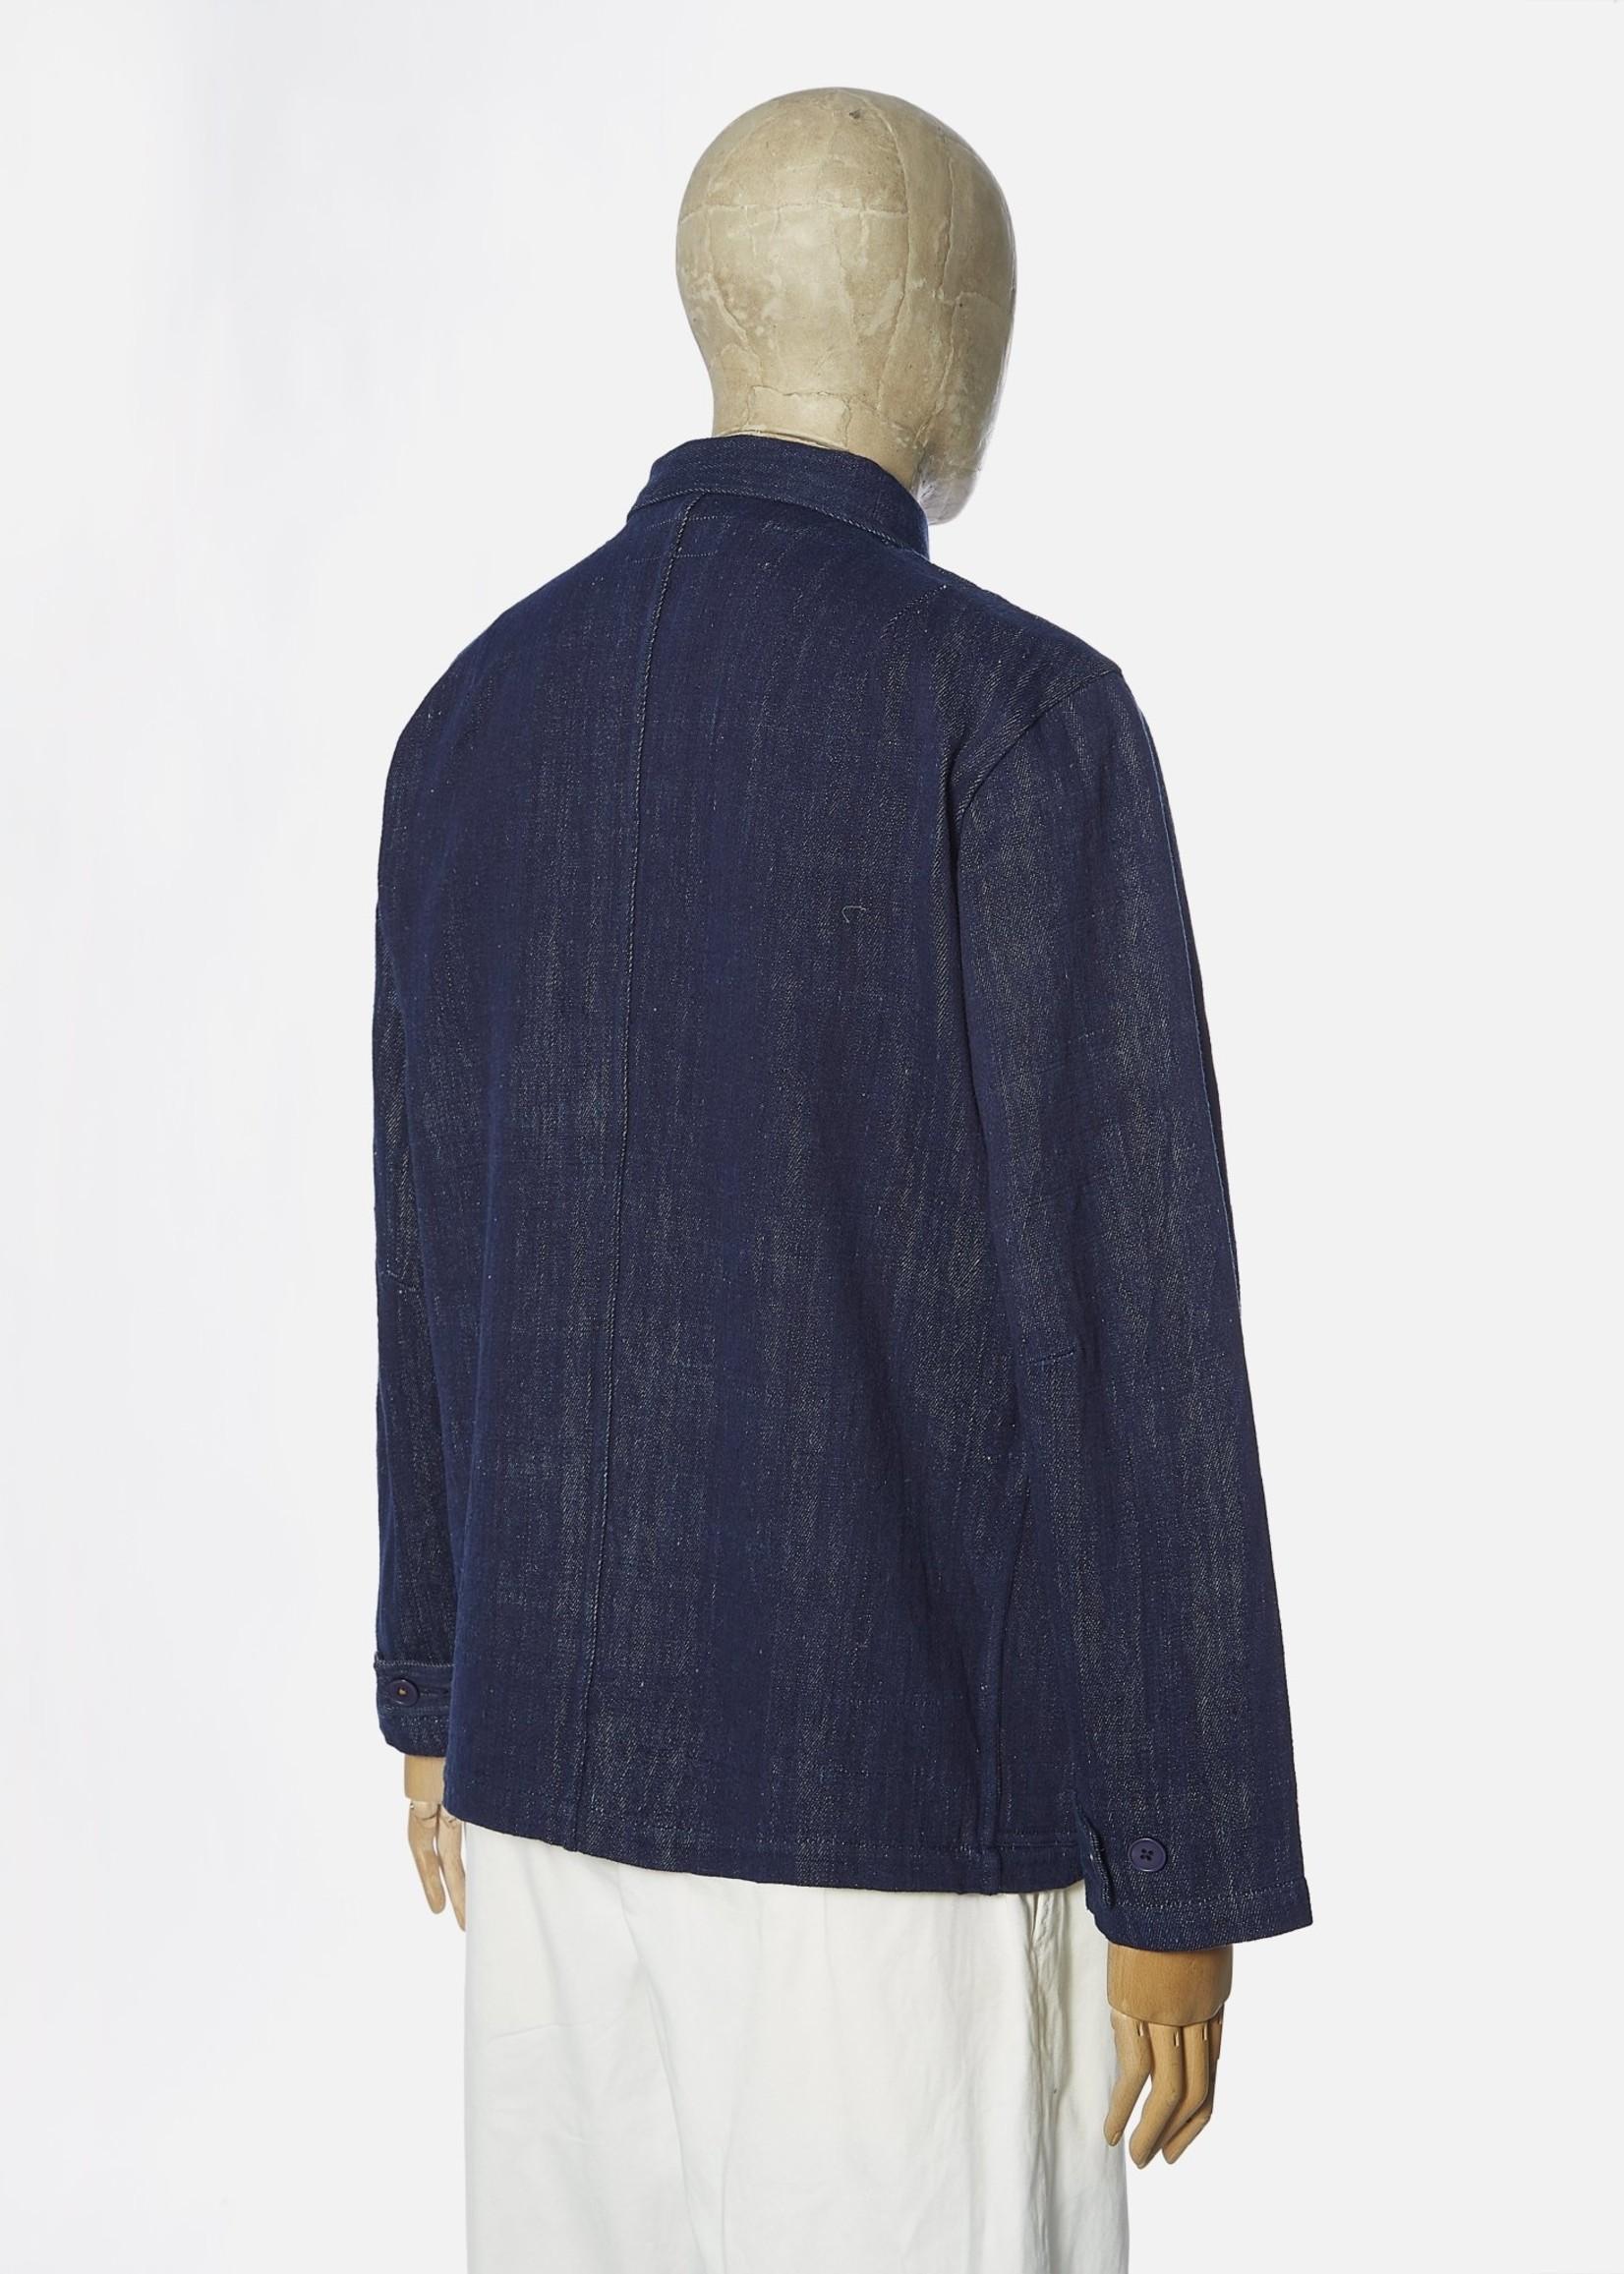 Universal Works Universal Works Labour Jacket II Indigo Handloom Denim